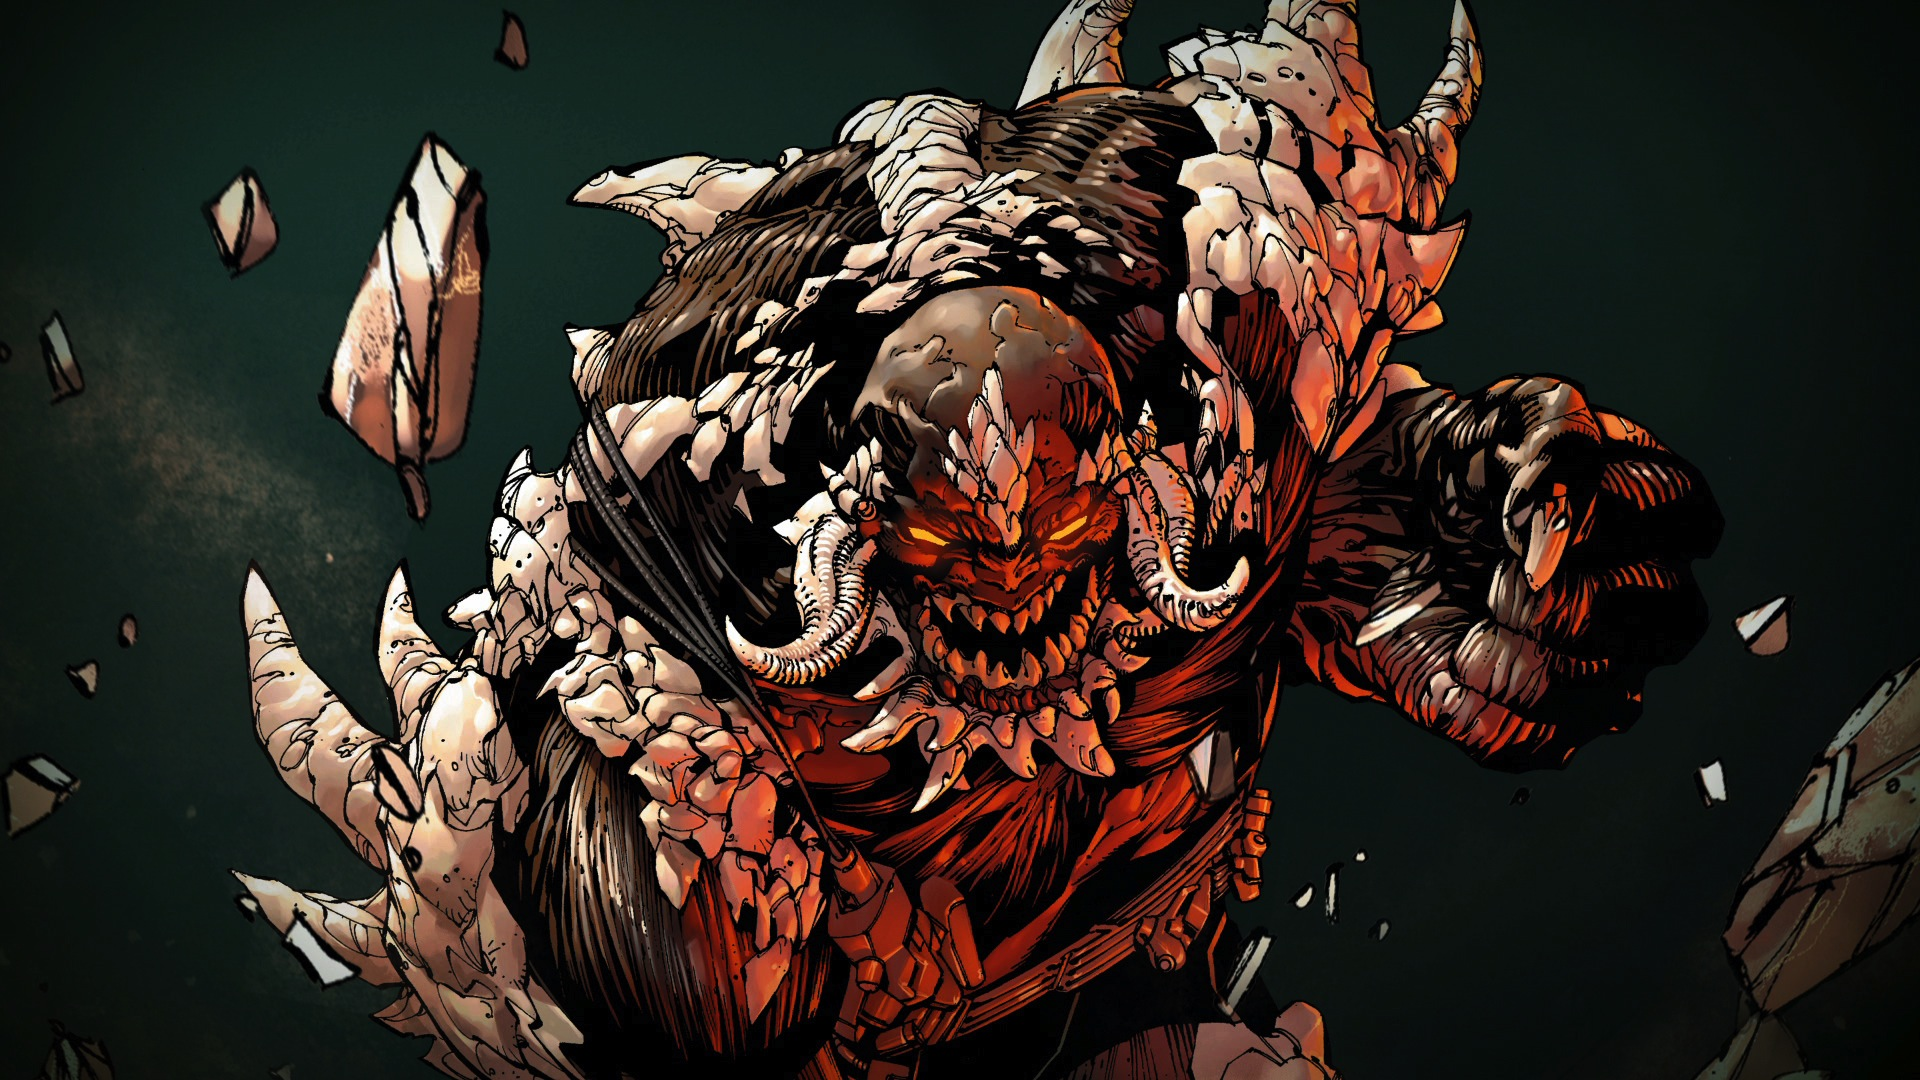 batman-v-superman-doomsday-confirmed-and-villain-easter-eggs-revealed